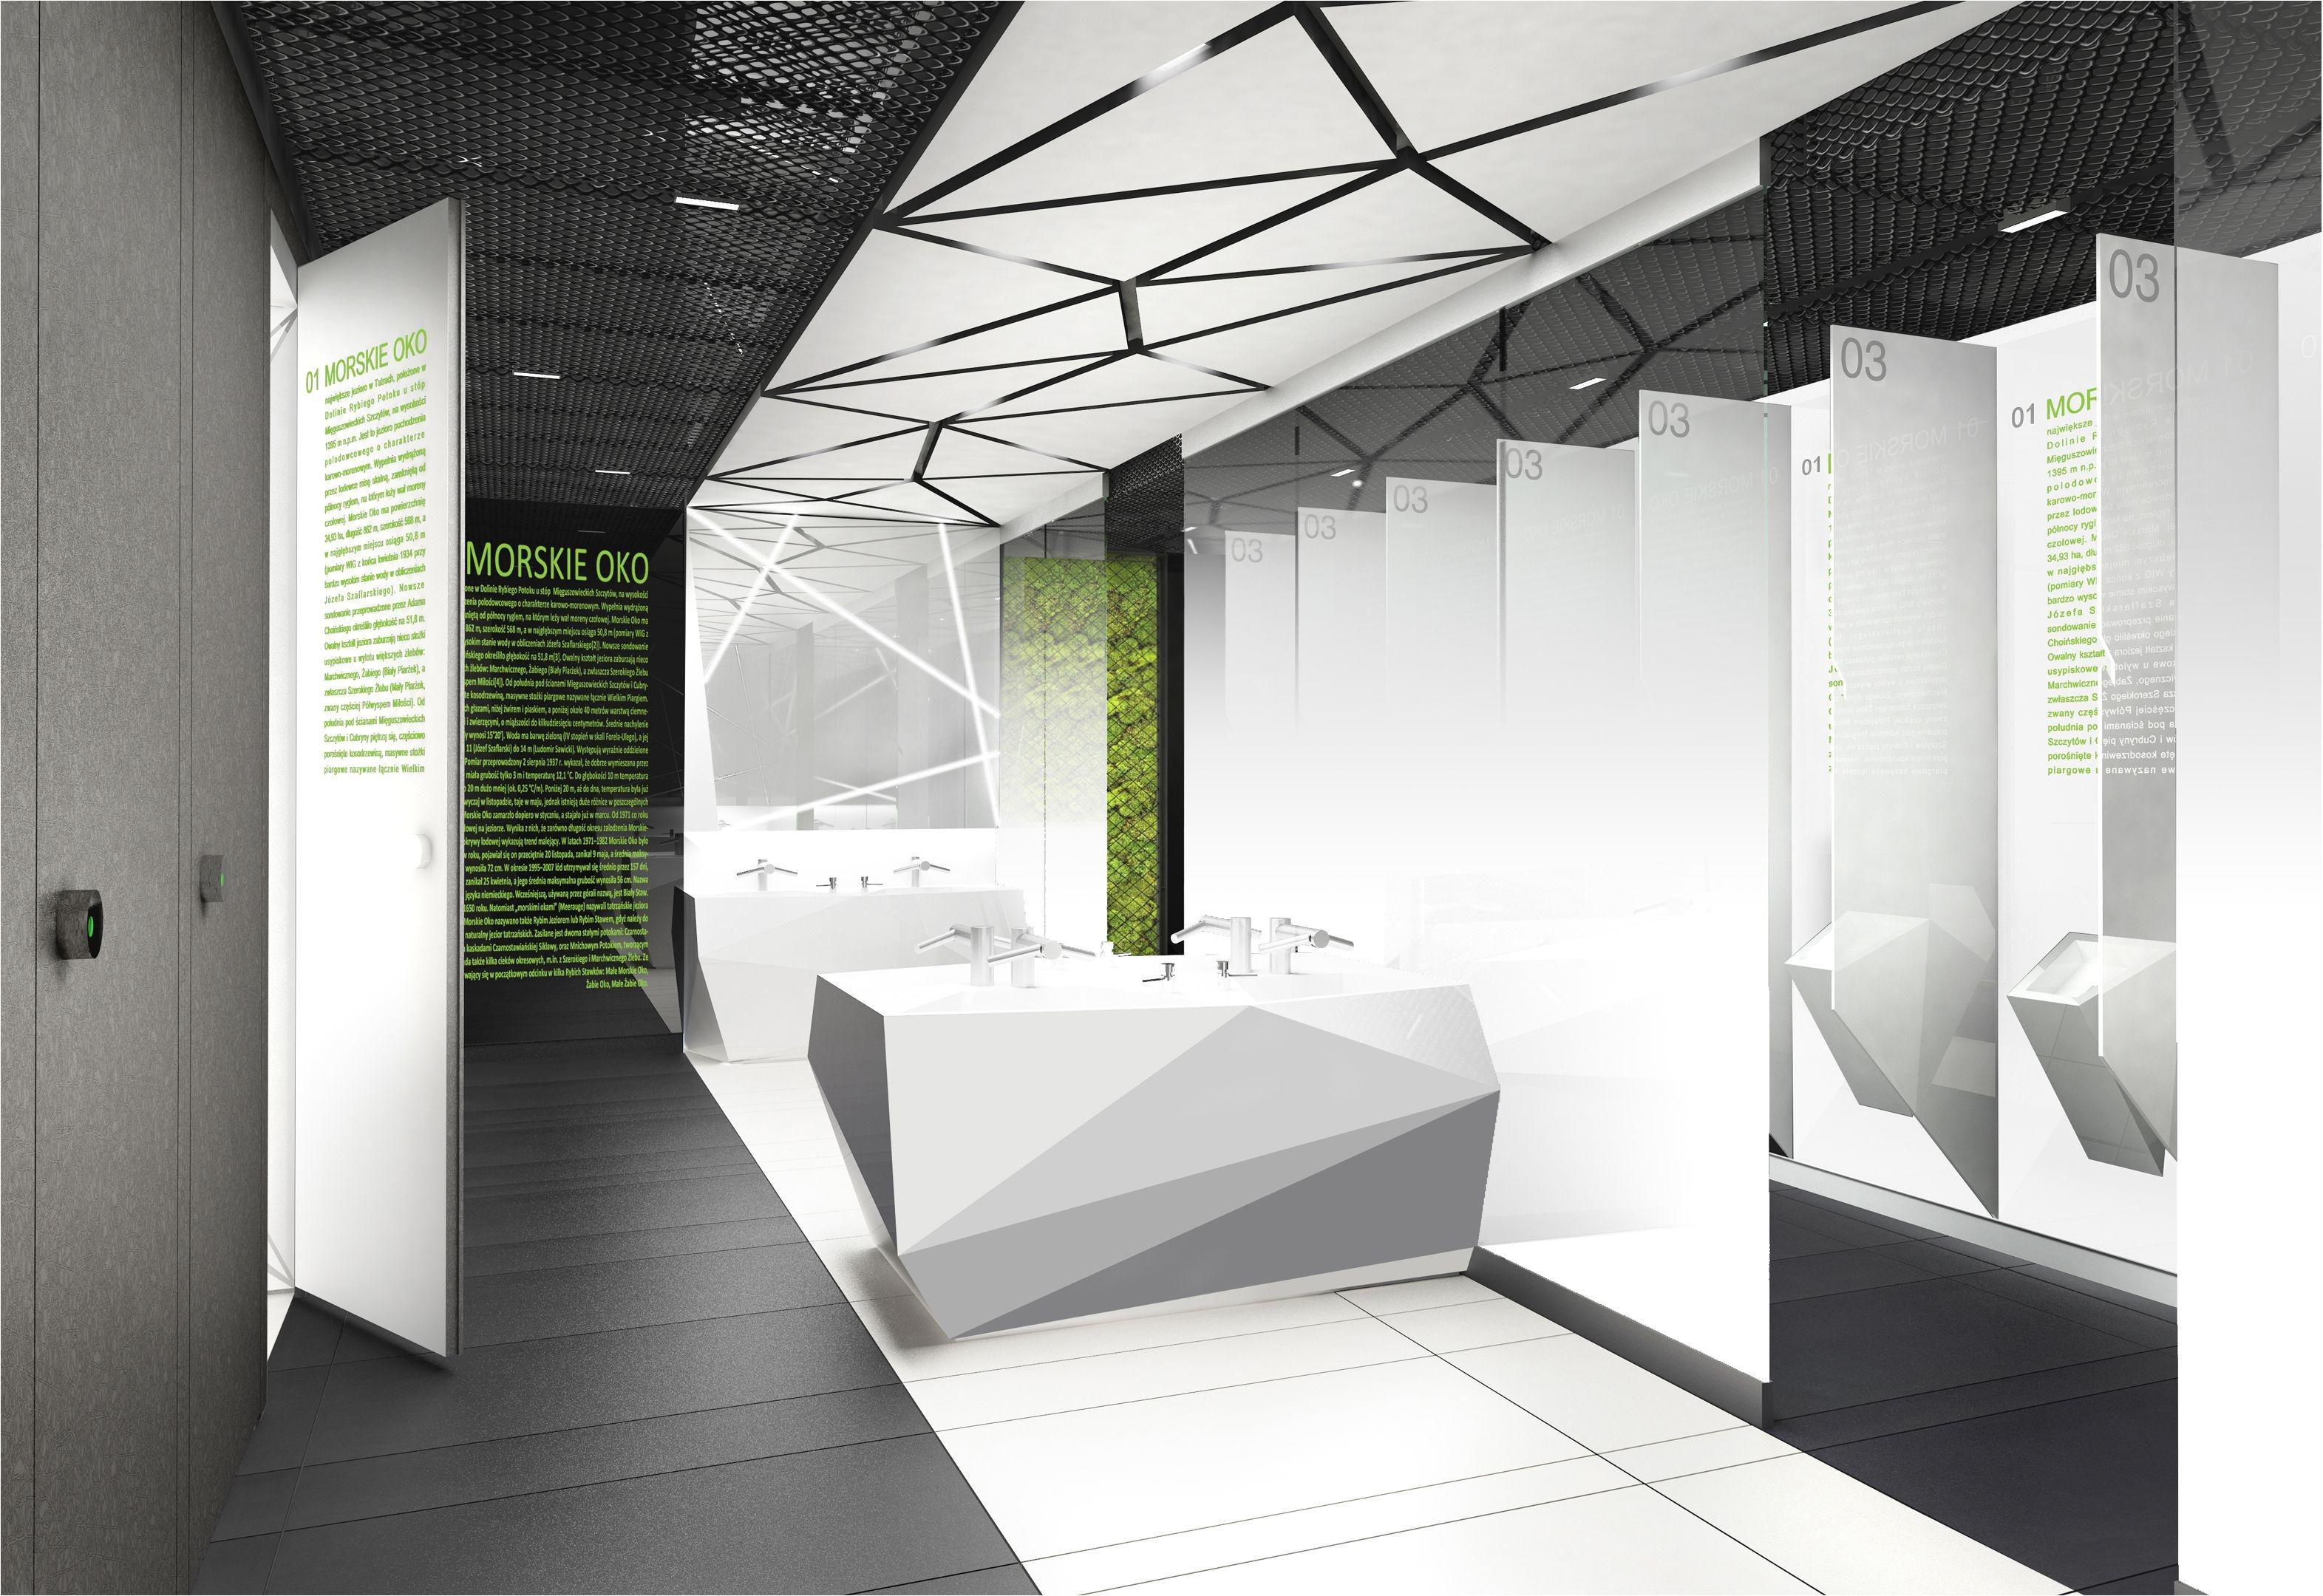 Design of the interior for public toilets and corridors in SC Złote Tarasy stage 02 geometric minimal zlotetarasy architecture design interiors art